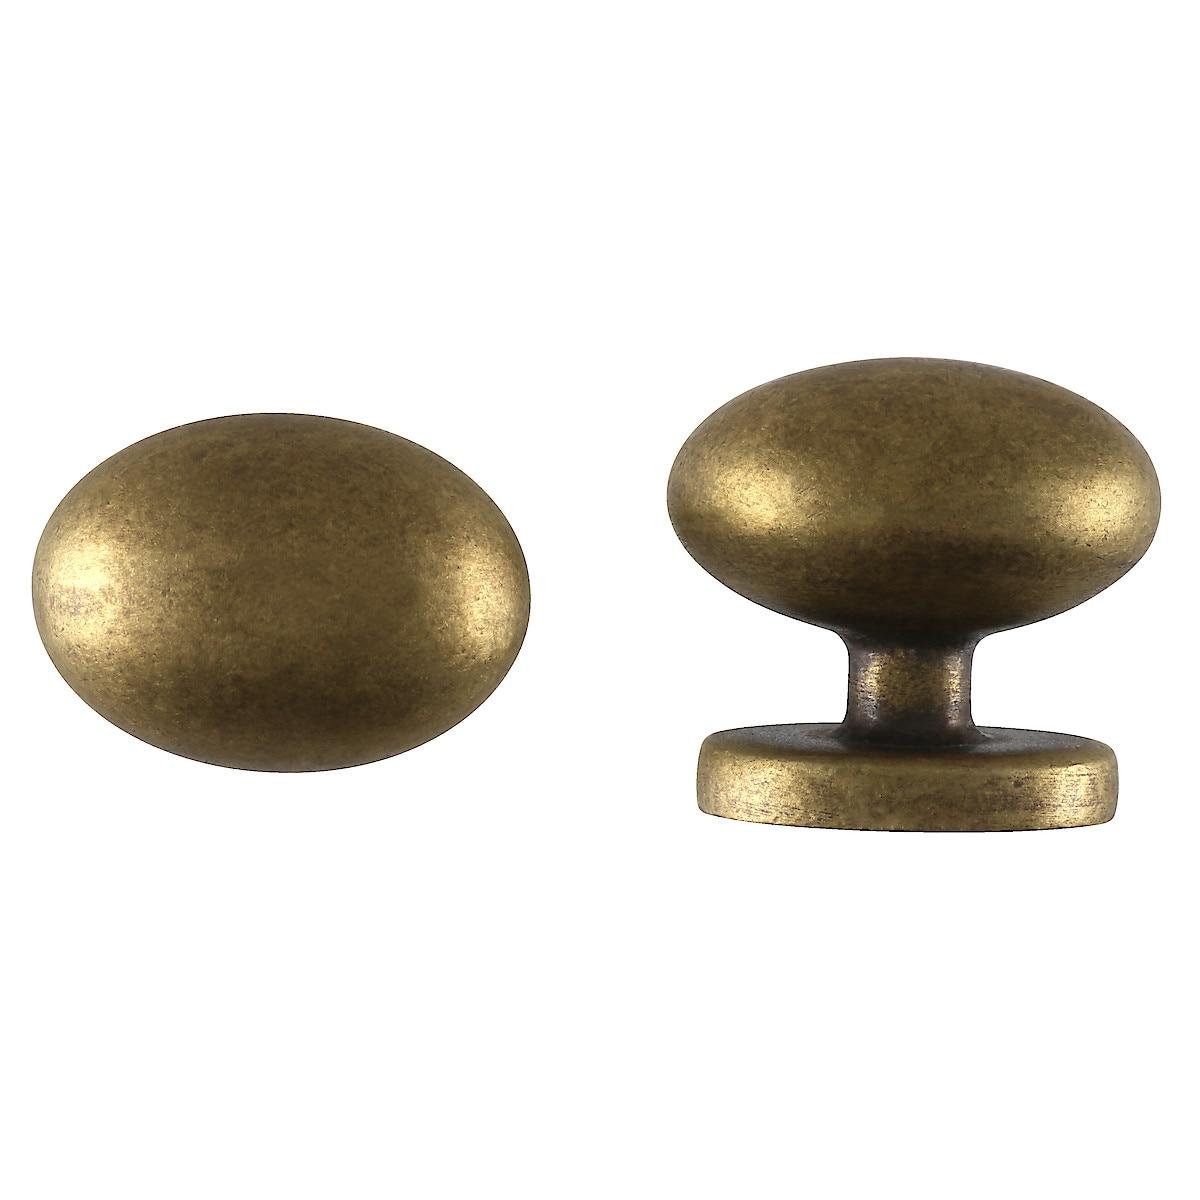 Oval knopp, antik guld